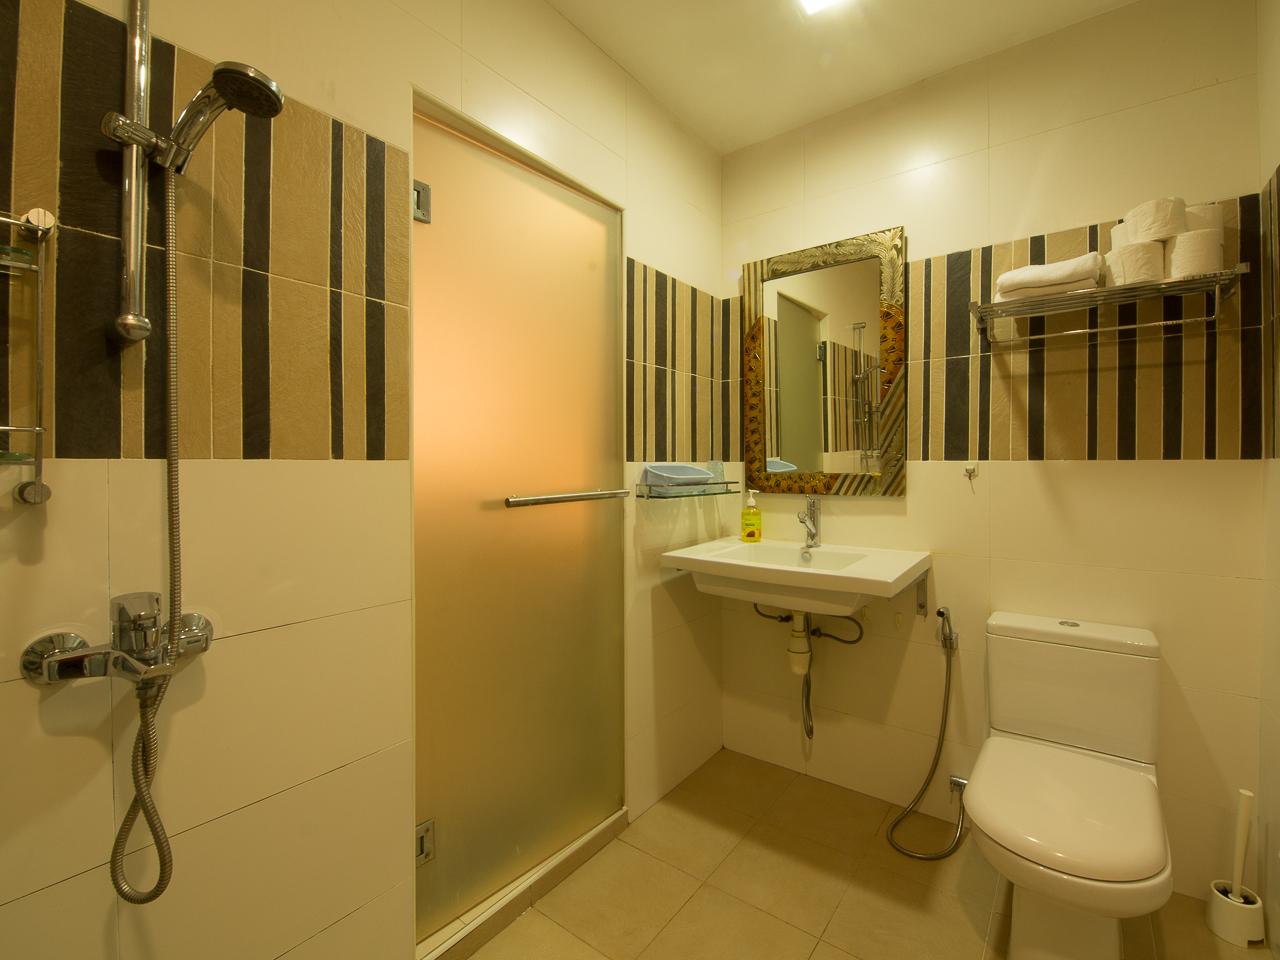 B101-Bathroom-03